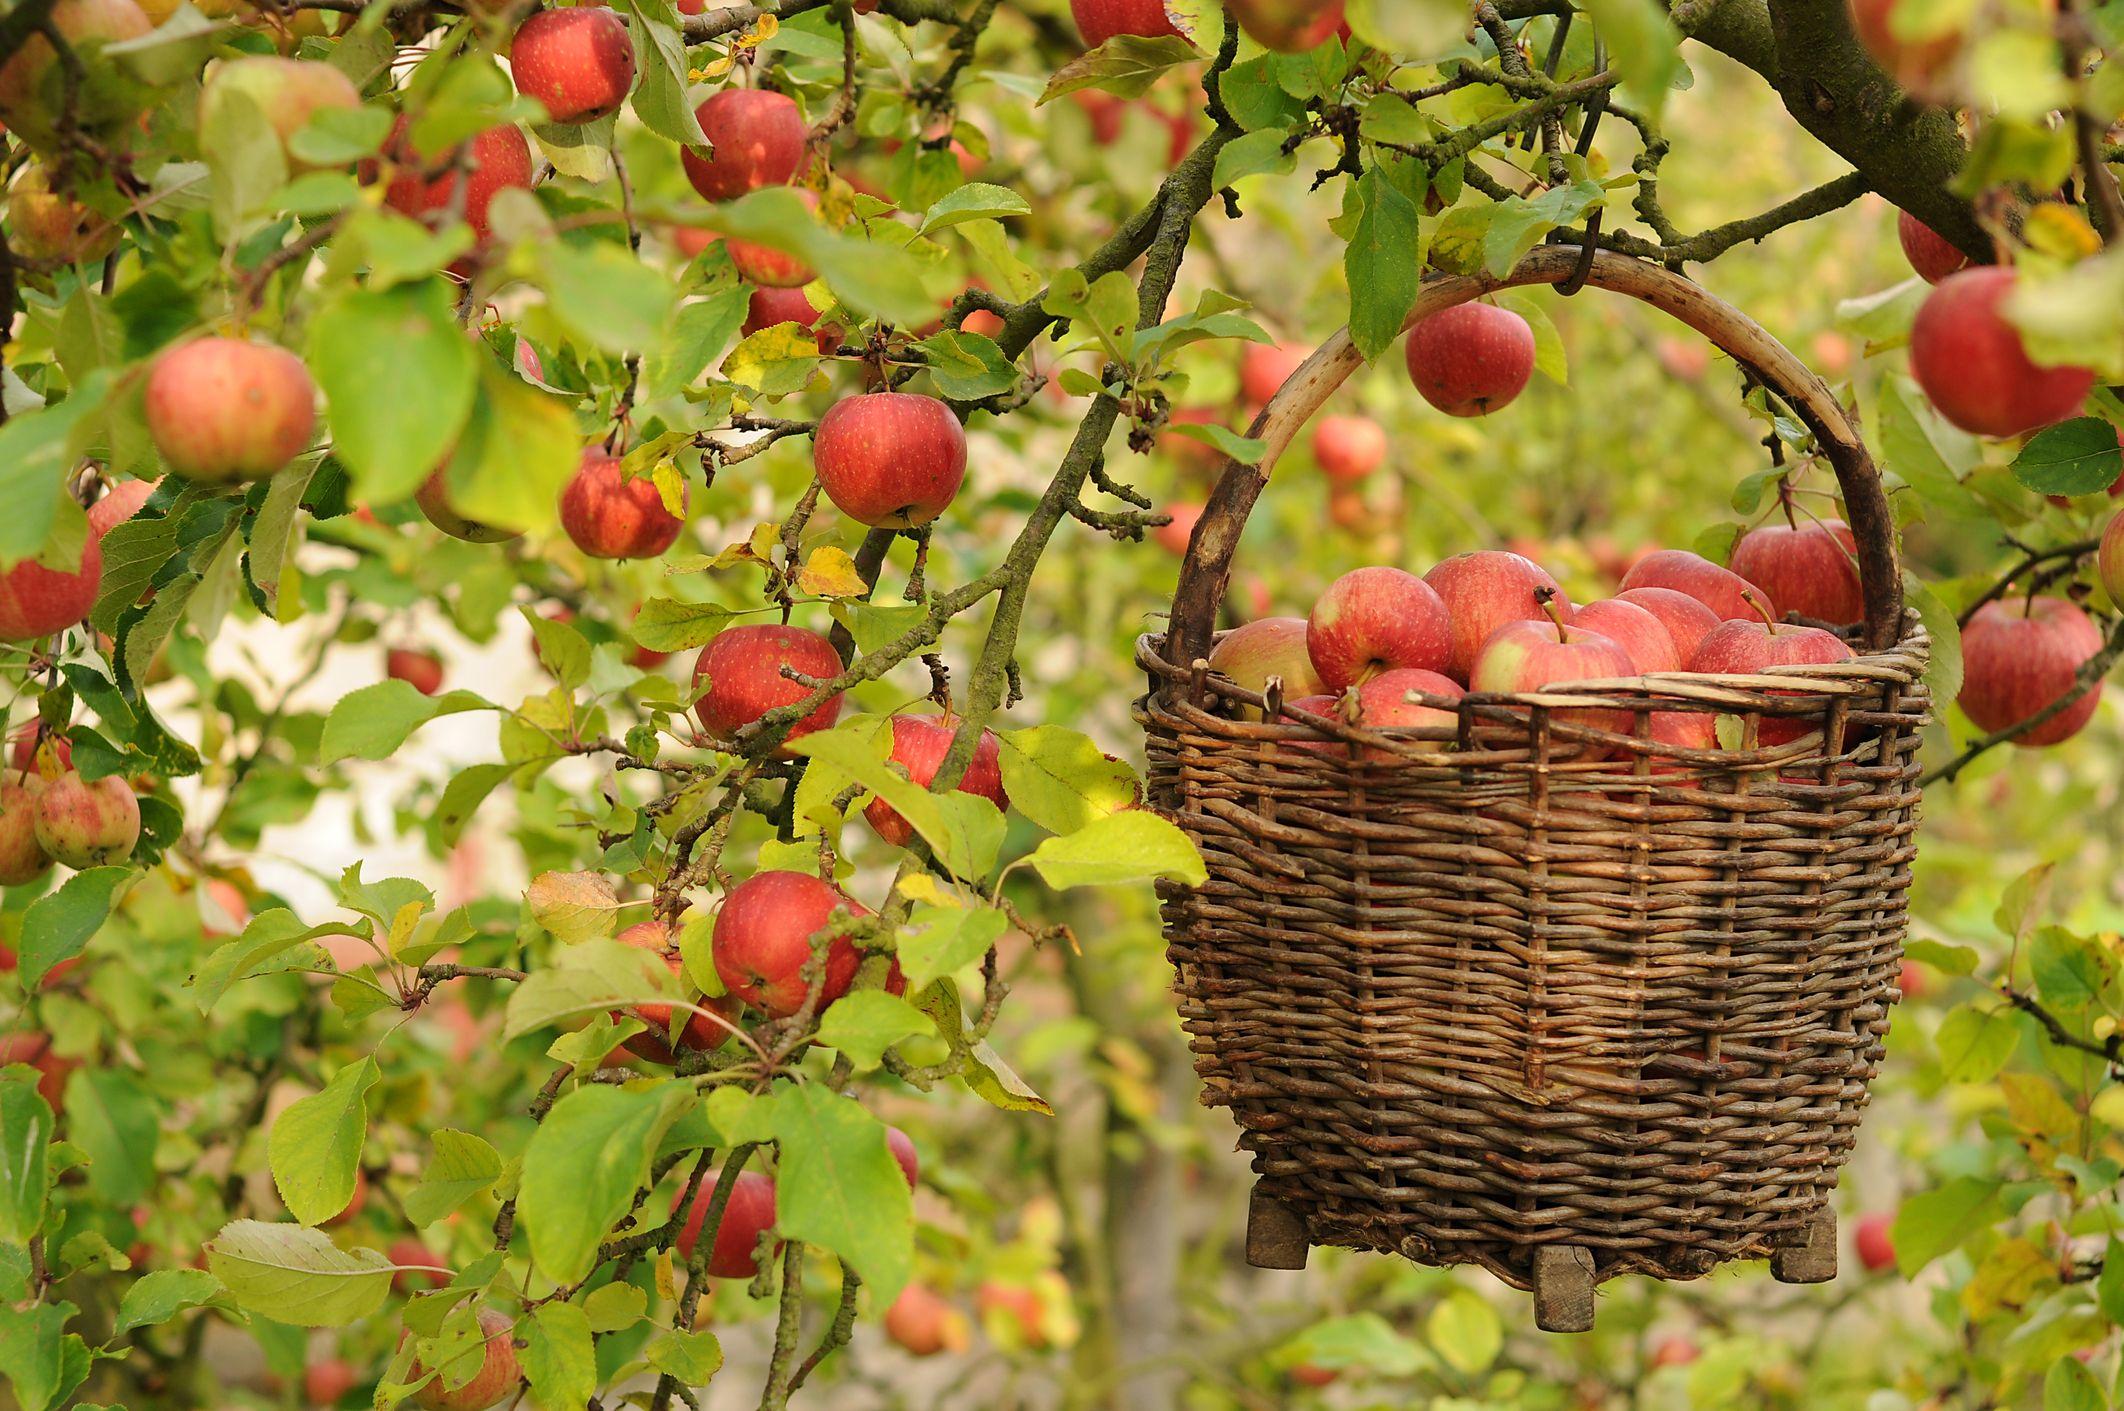 Lincoln county apple festival fall garden vegetables